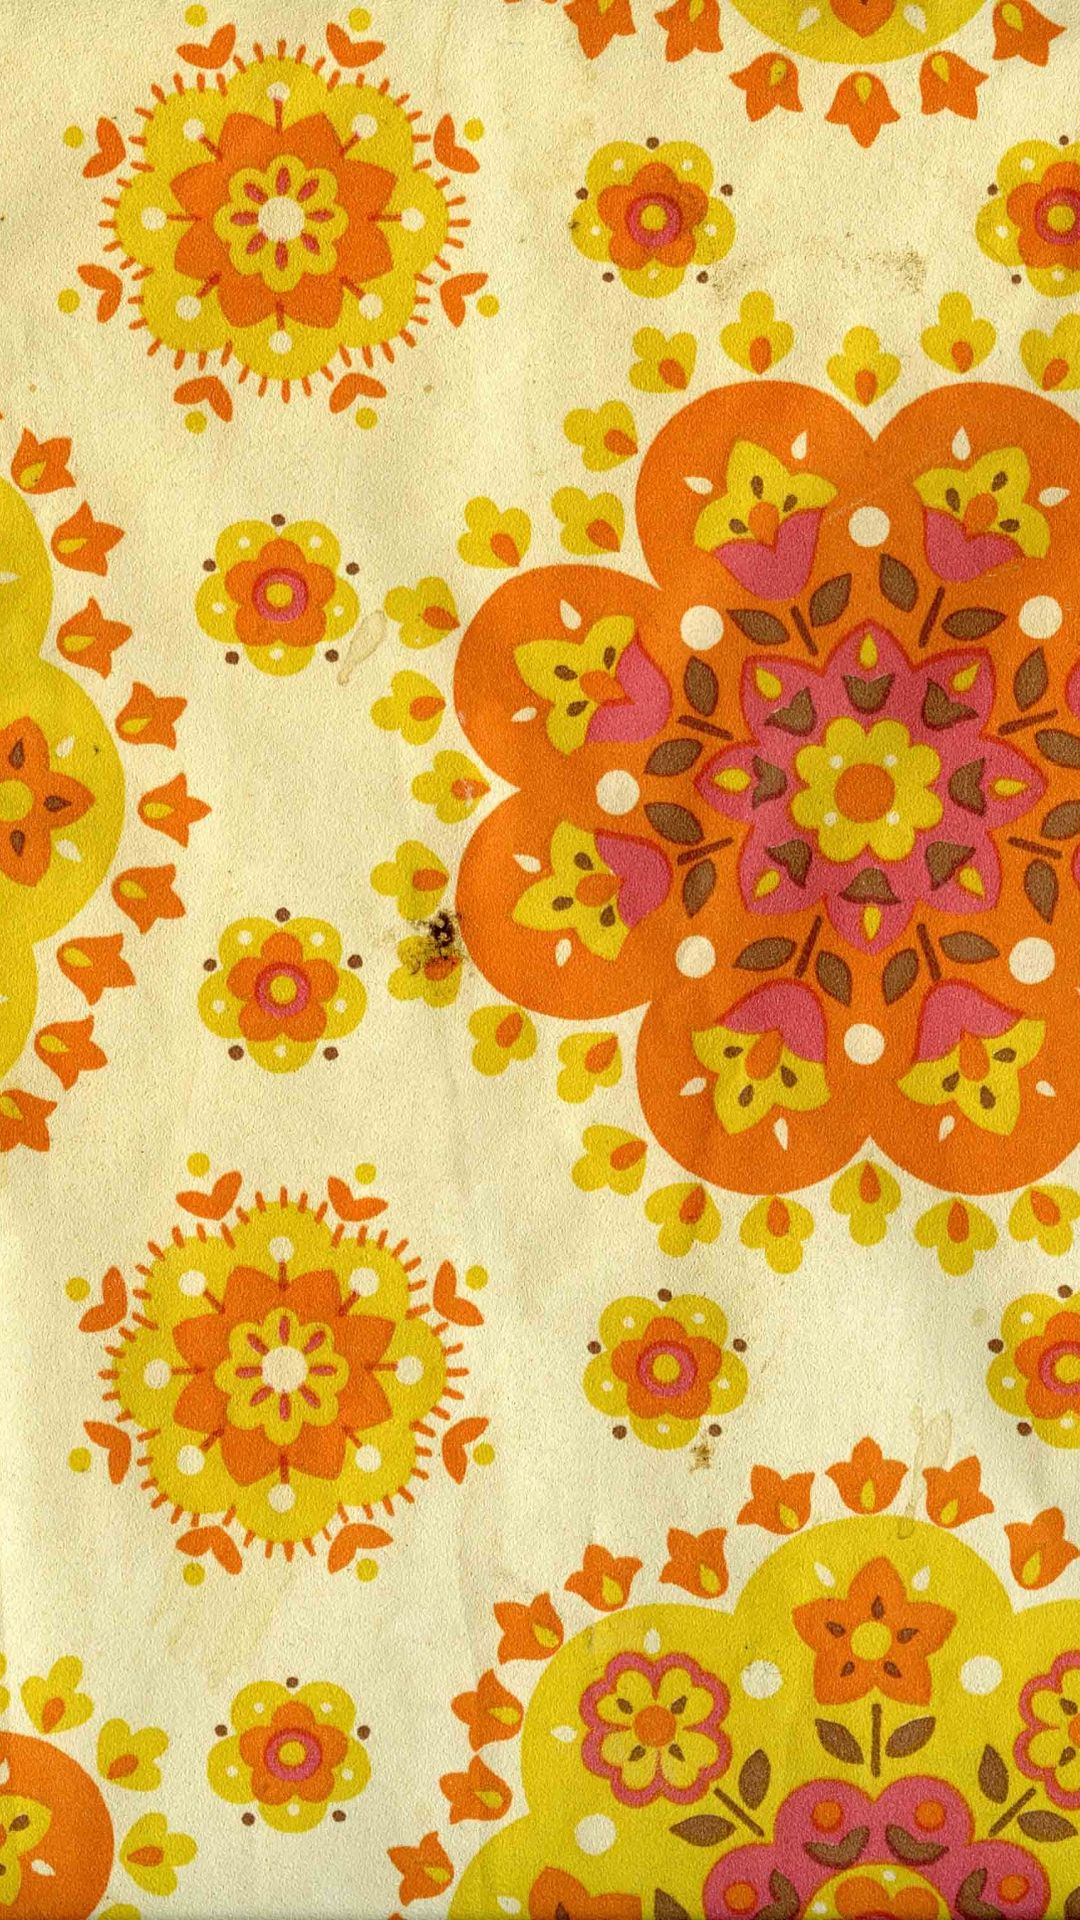 Vintage Hippie Phone Wallpaper Flower Phone Wallpaper Flower Wallpaper Retro Wallpaper